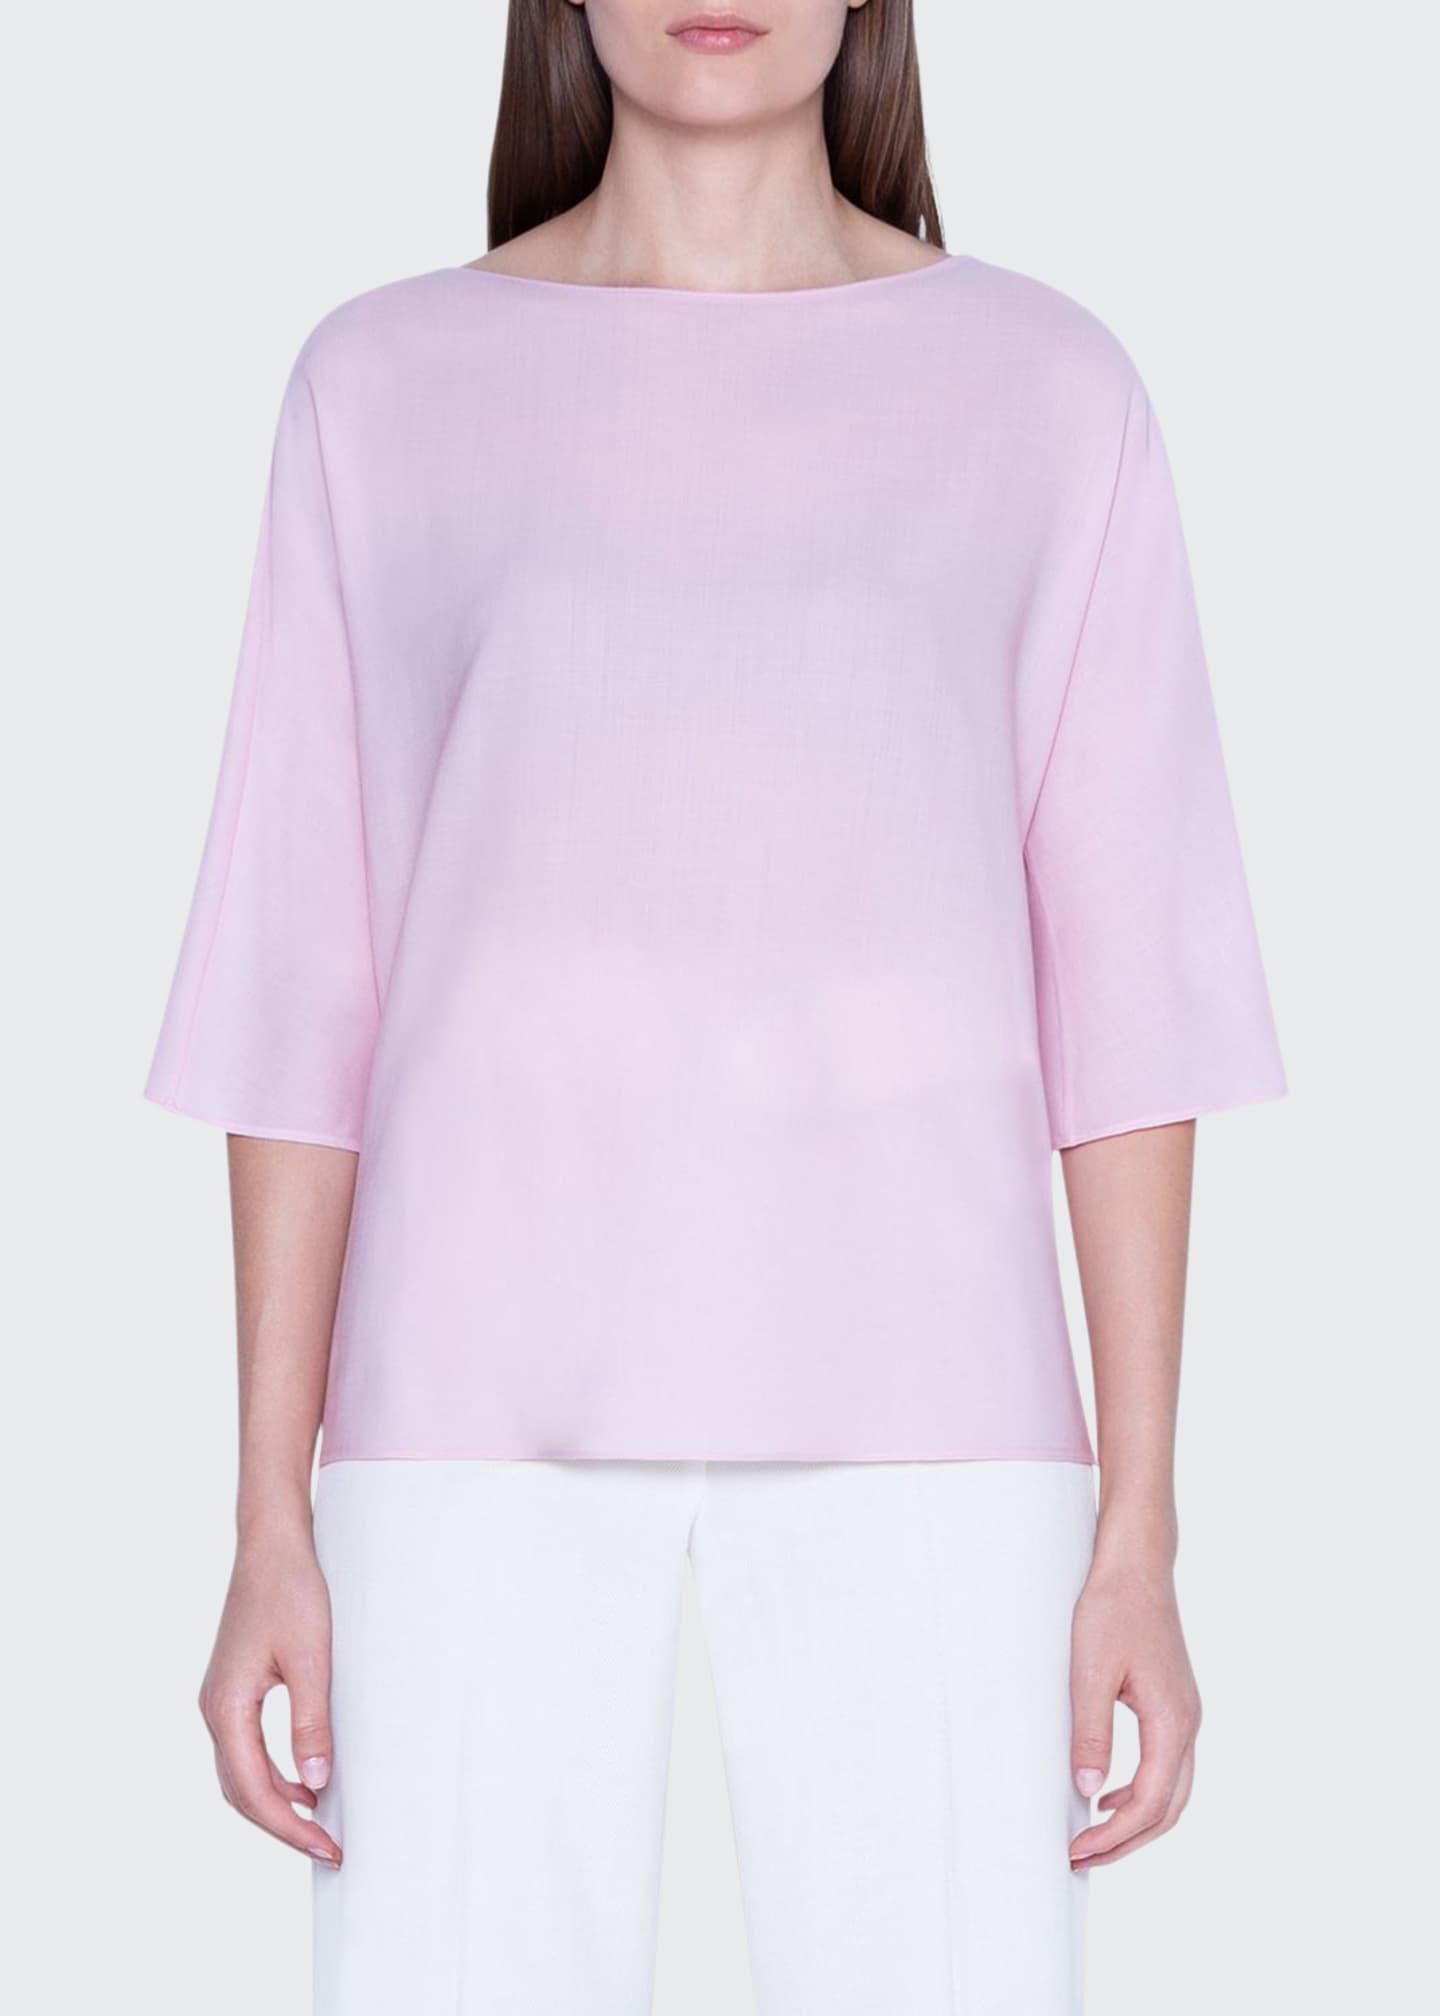 Akris 3/4-Sleeve Wool-Silk Crewneck Top